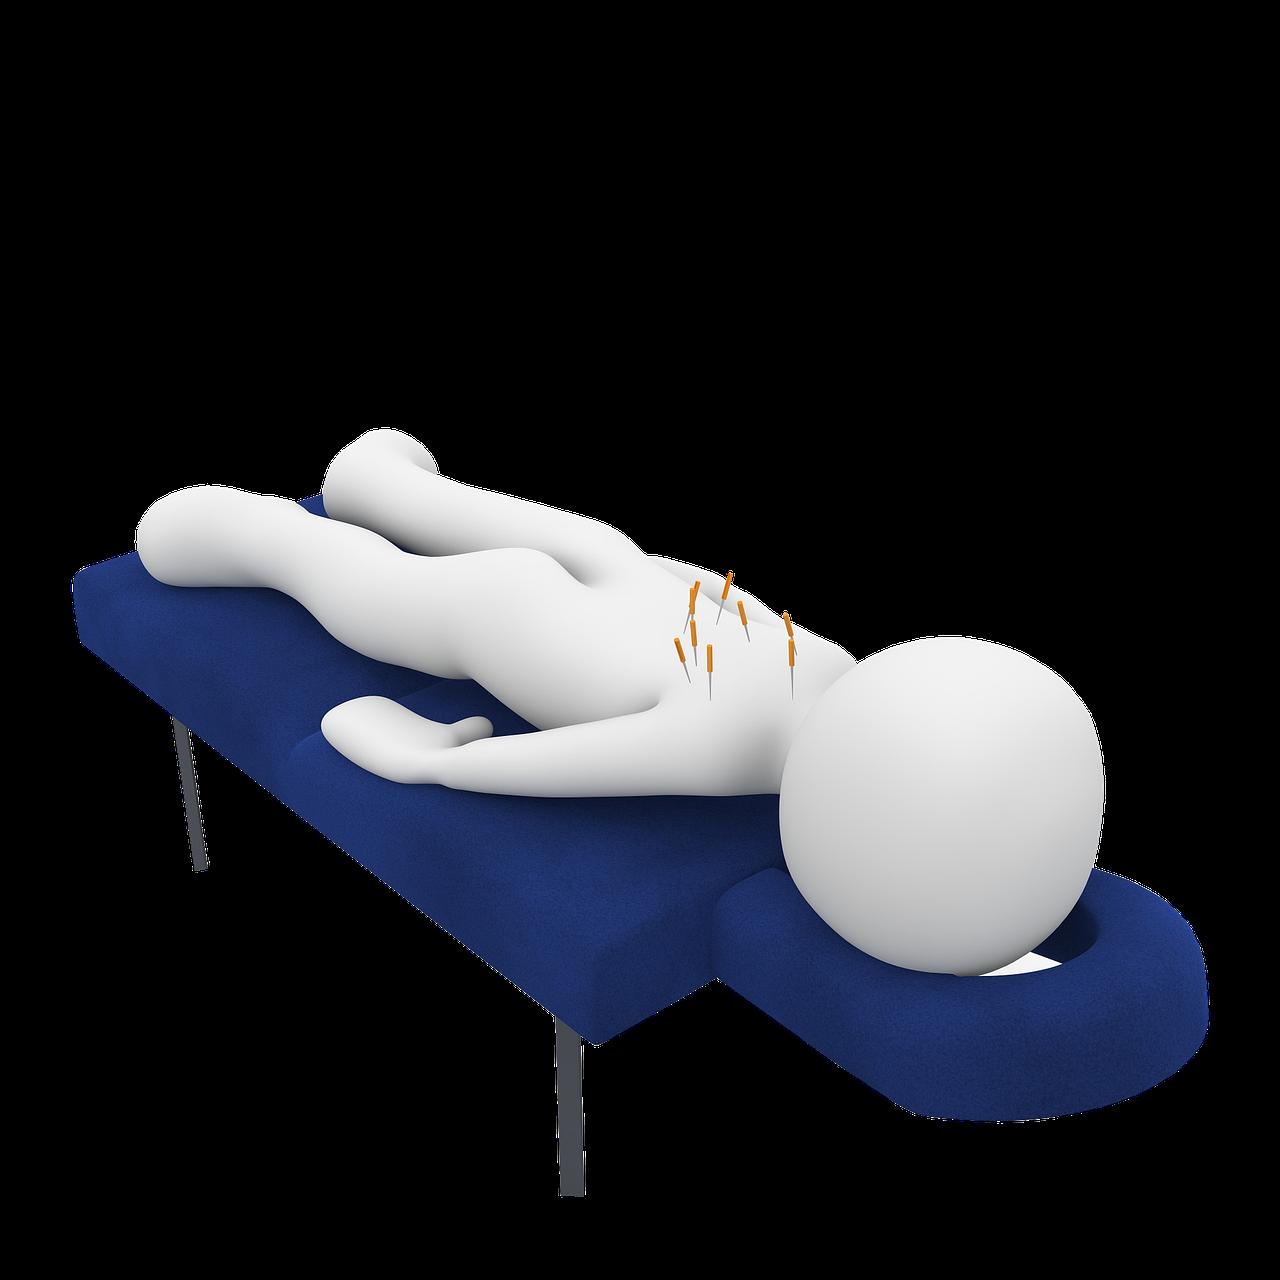 Fysio-Manueeltherapie Teunissen dry needling